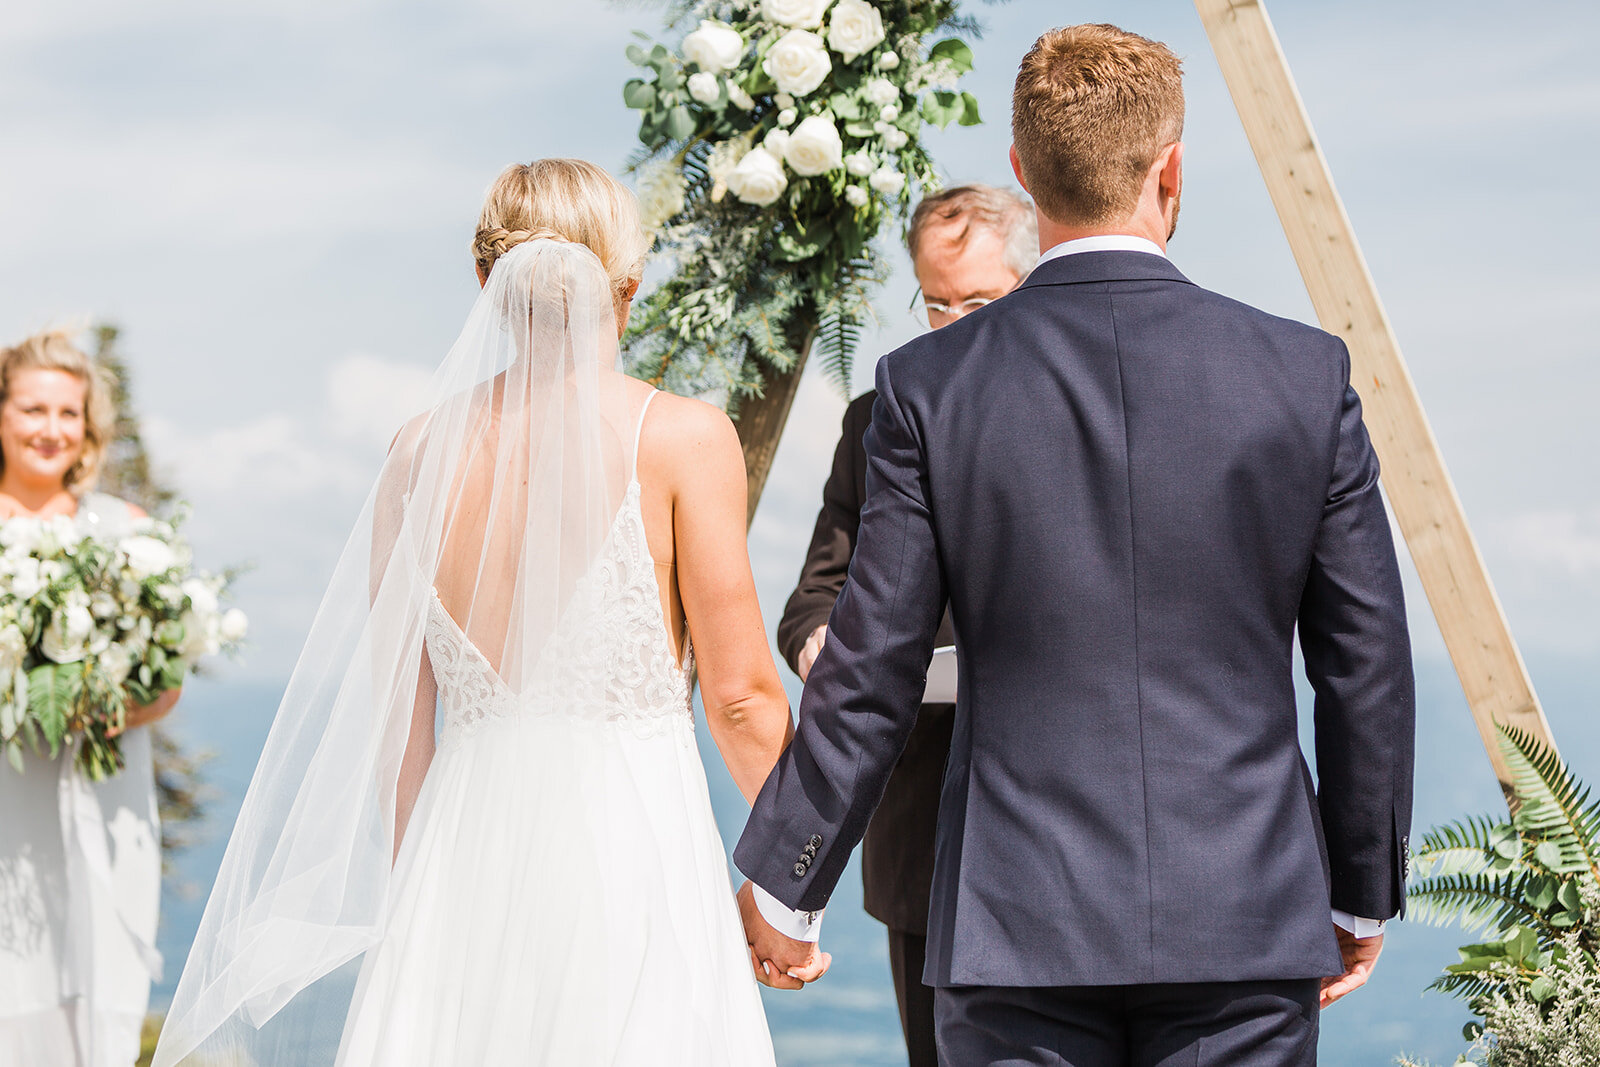 bride and groom spokane wedding ceremony